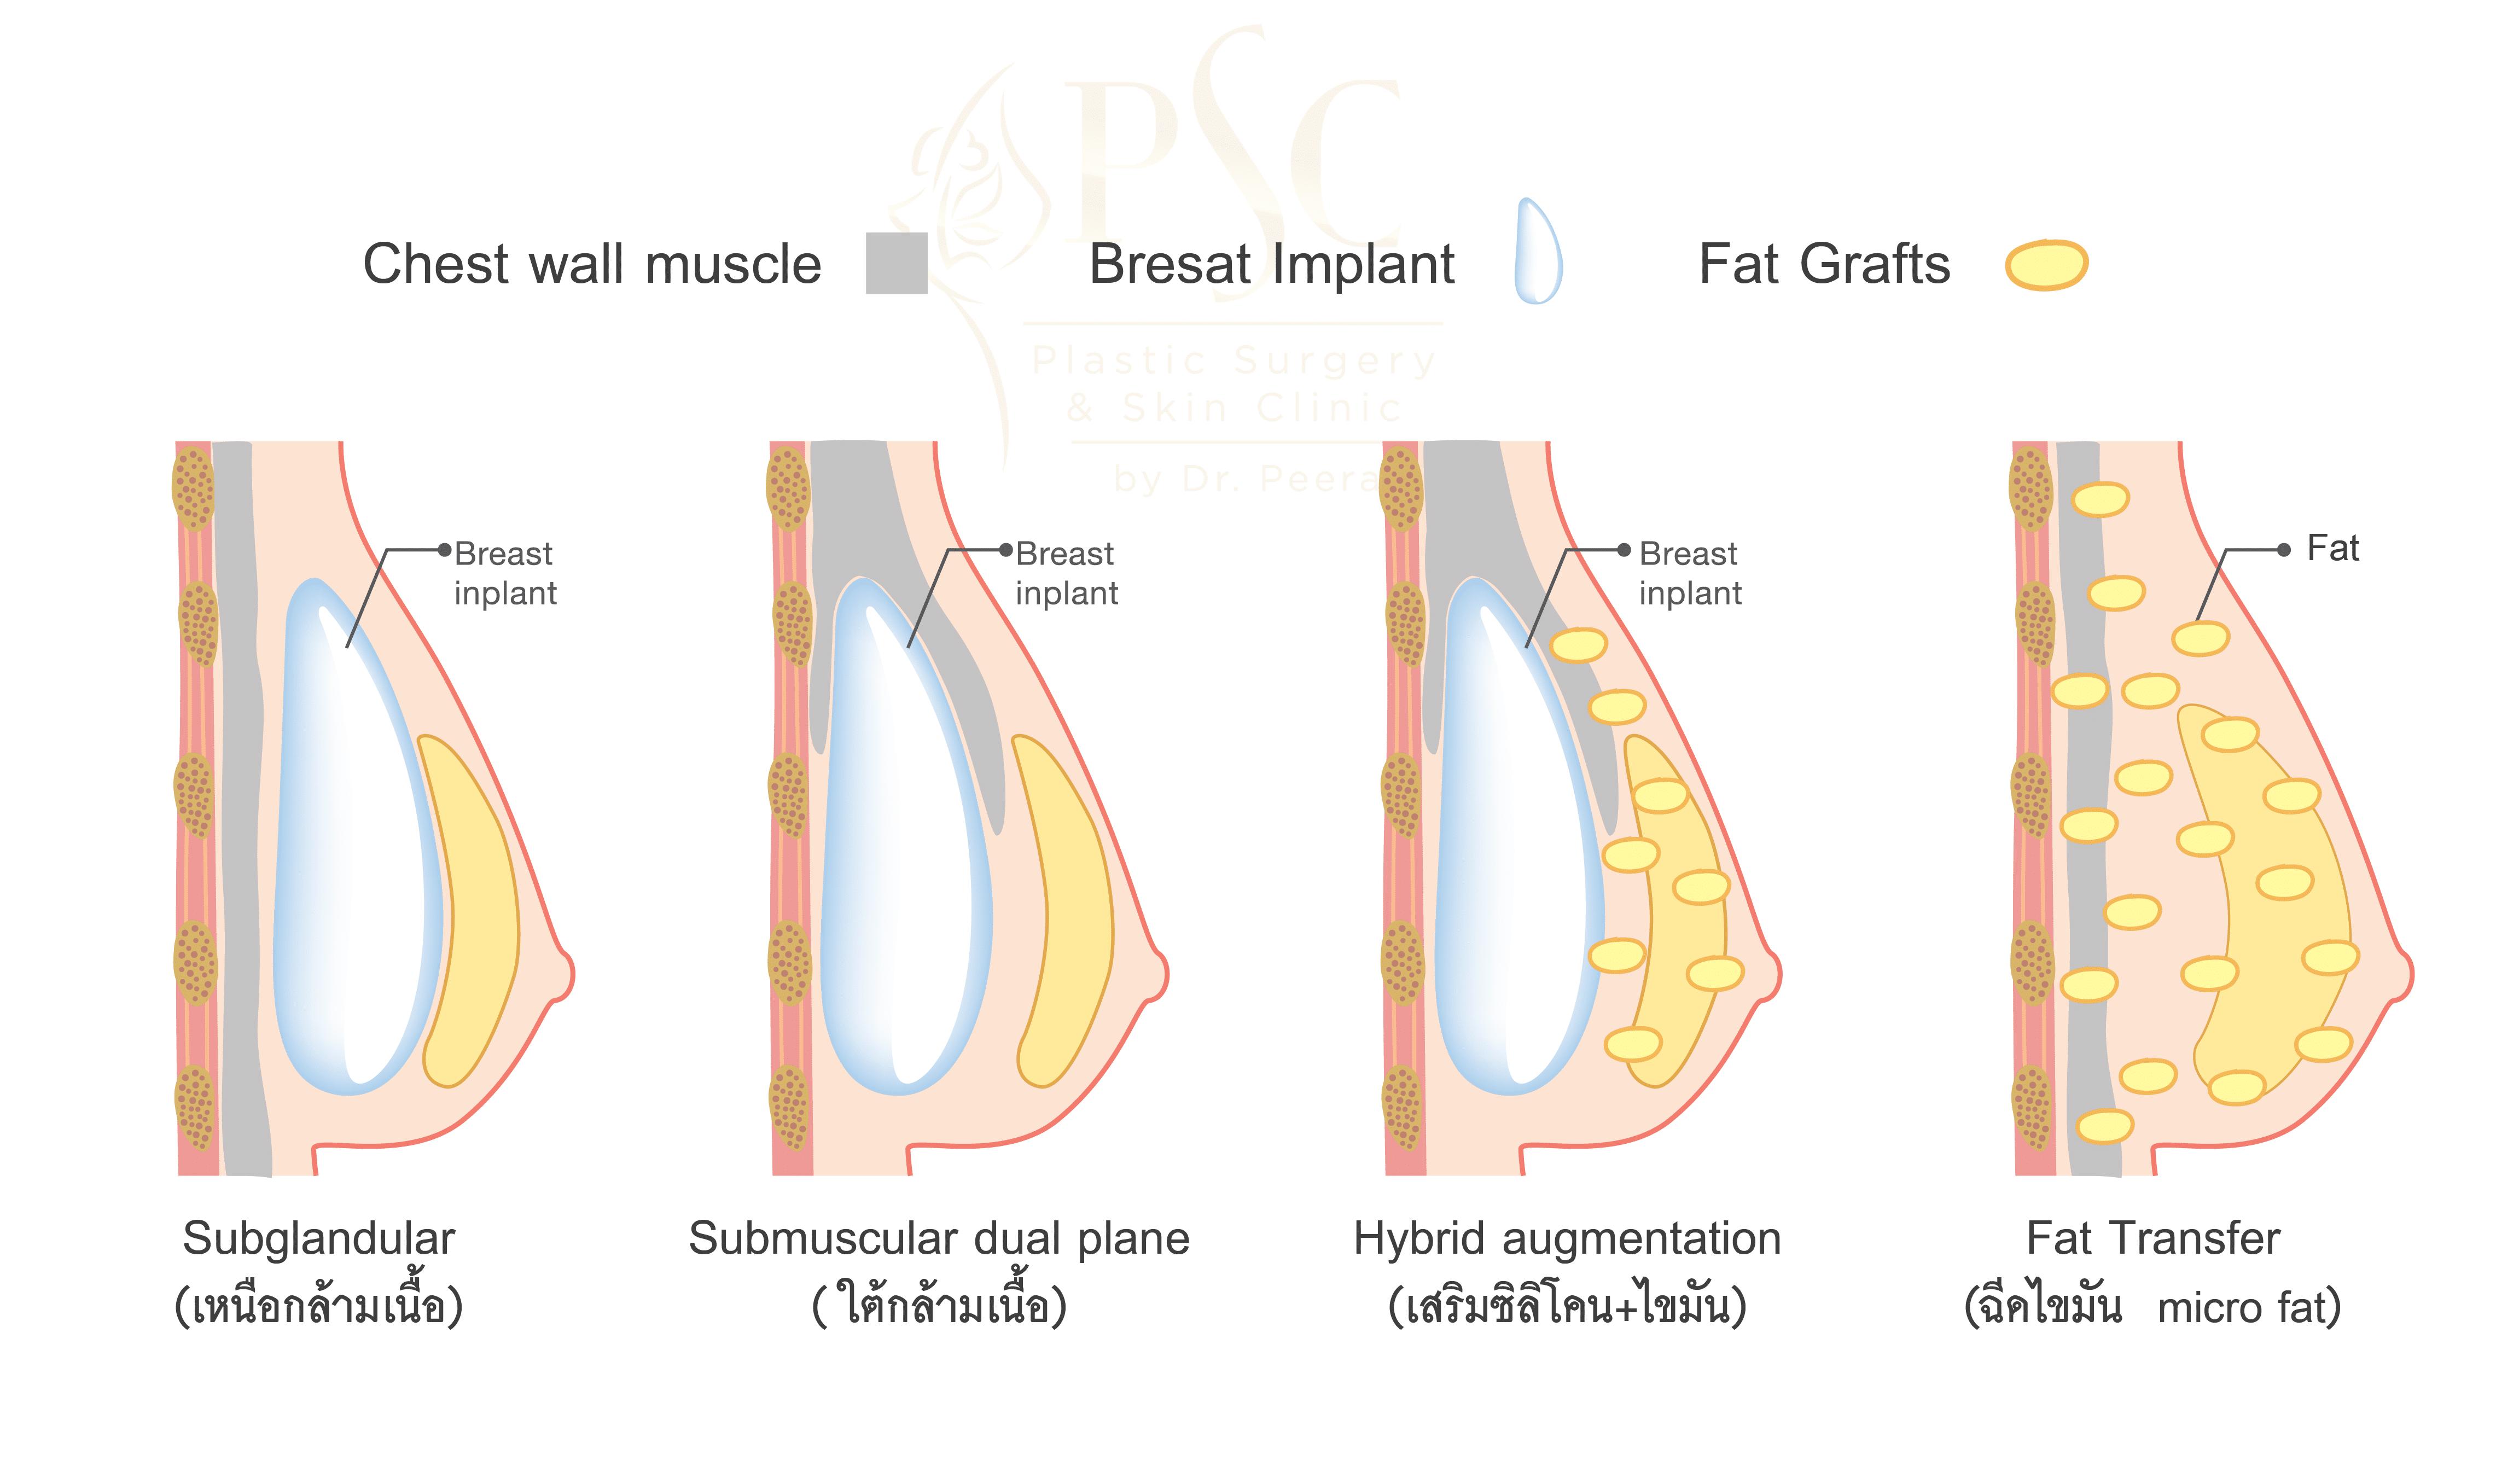 Sugery Breast 01 - คลินิกเสริมหน้าอก โดยหมอพีระ PSC Clinic ศัลยกรรมหน้าอก เสริมนม Breast Augmentation